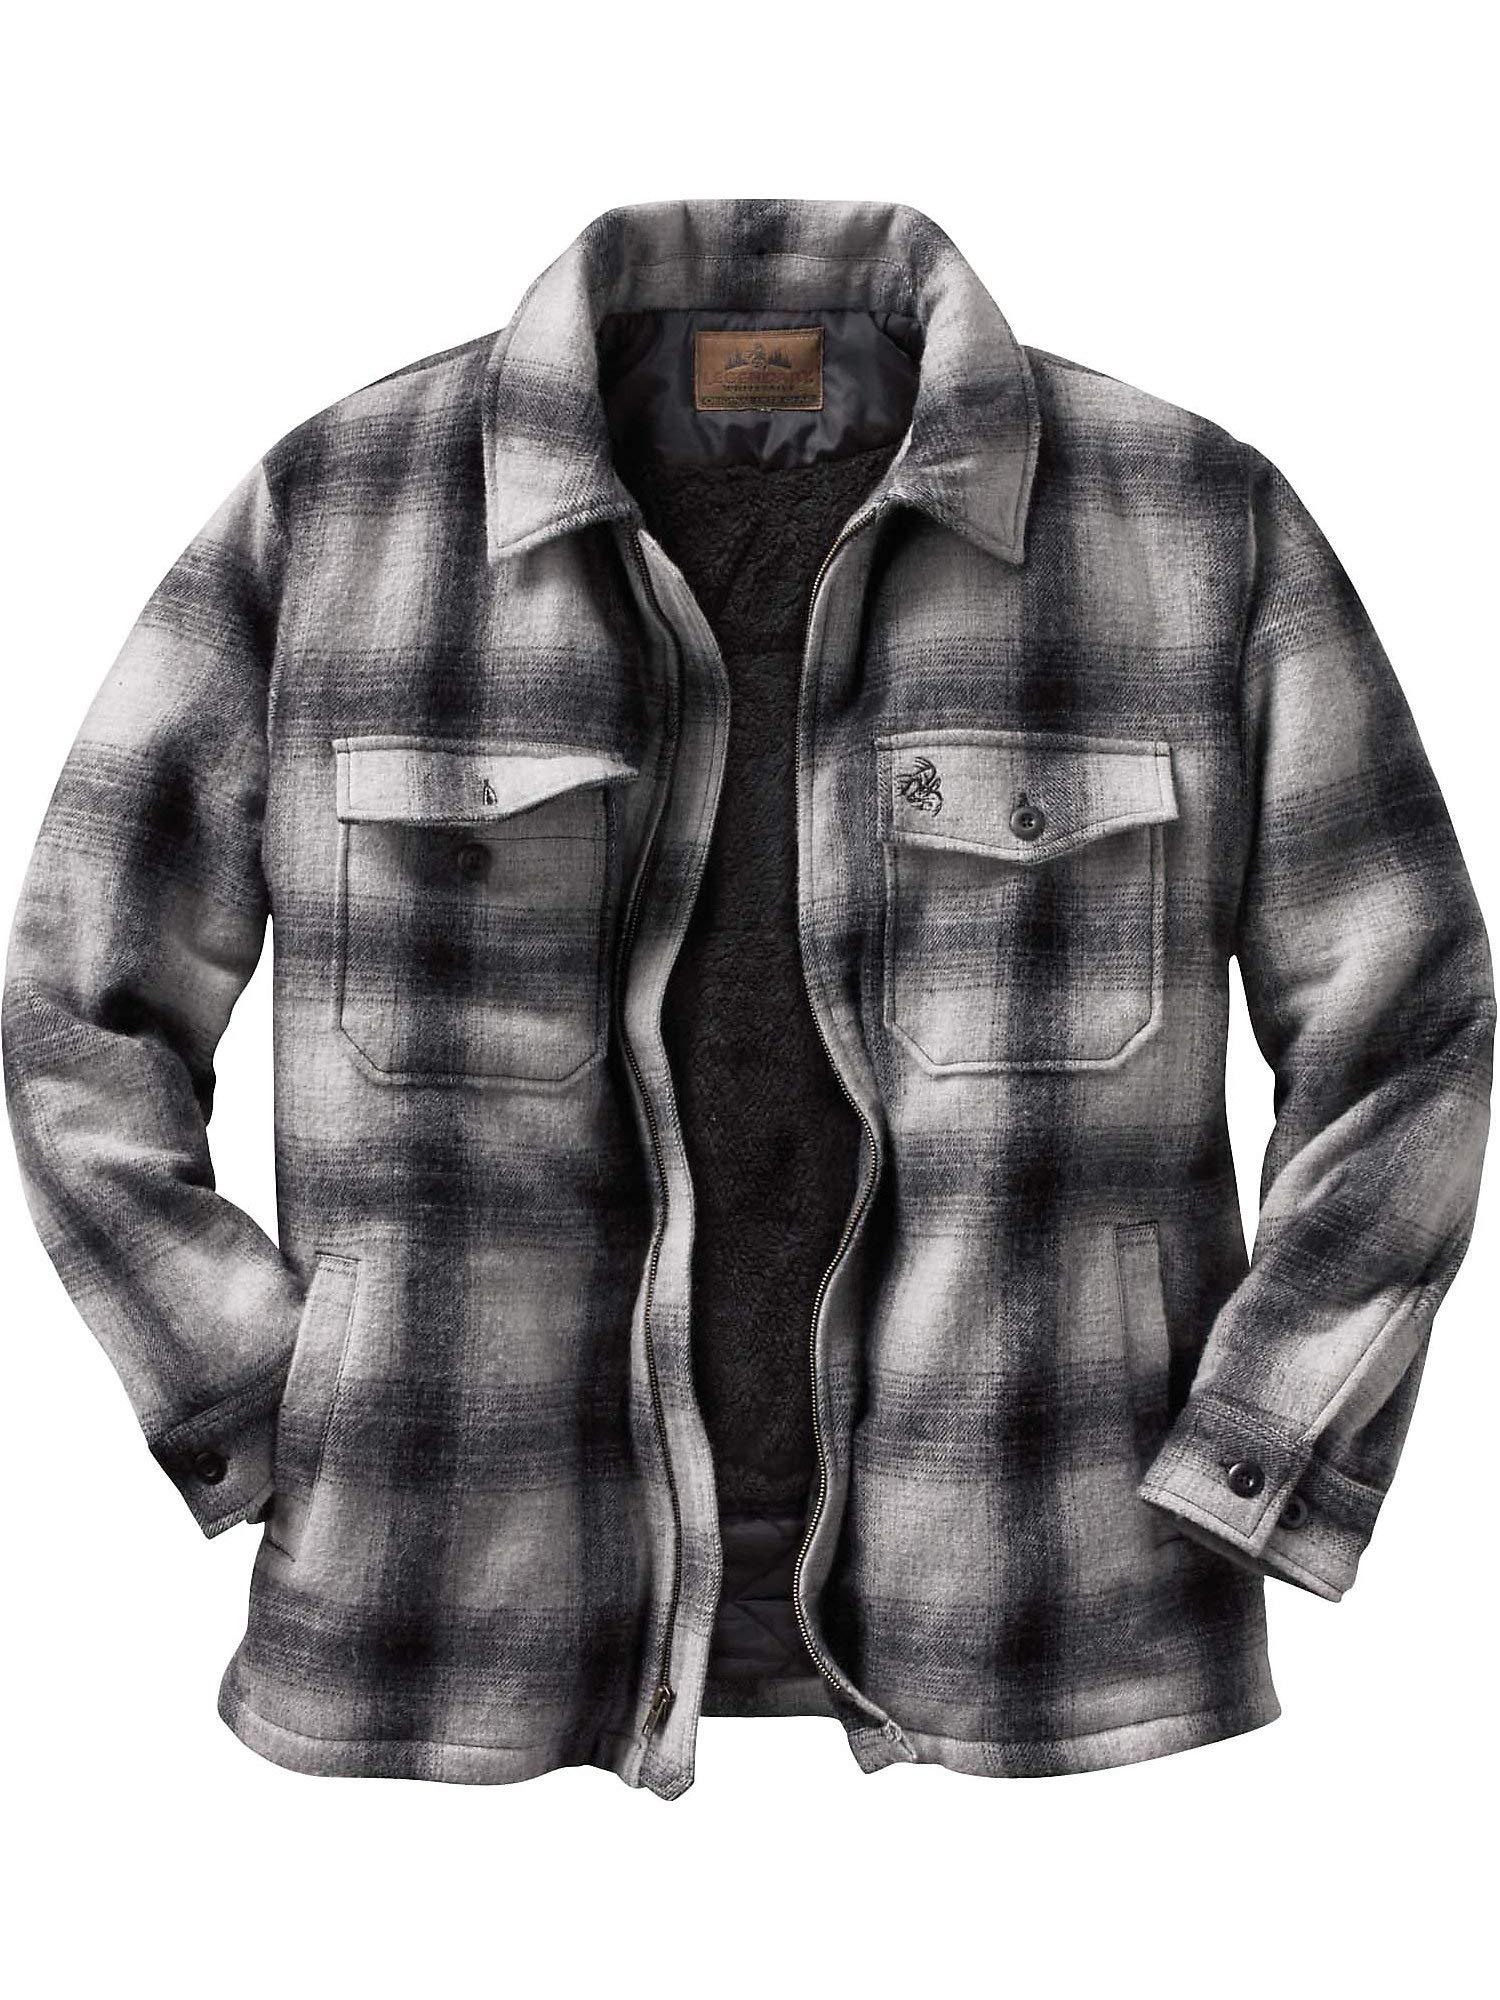 061ecfcf3a Legendary Whitetails The Outdoorsman Buffalo Plaid Jacket product image